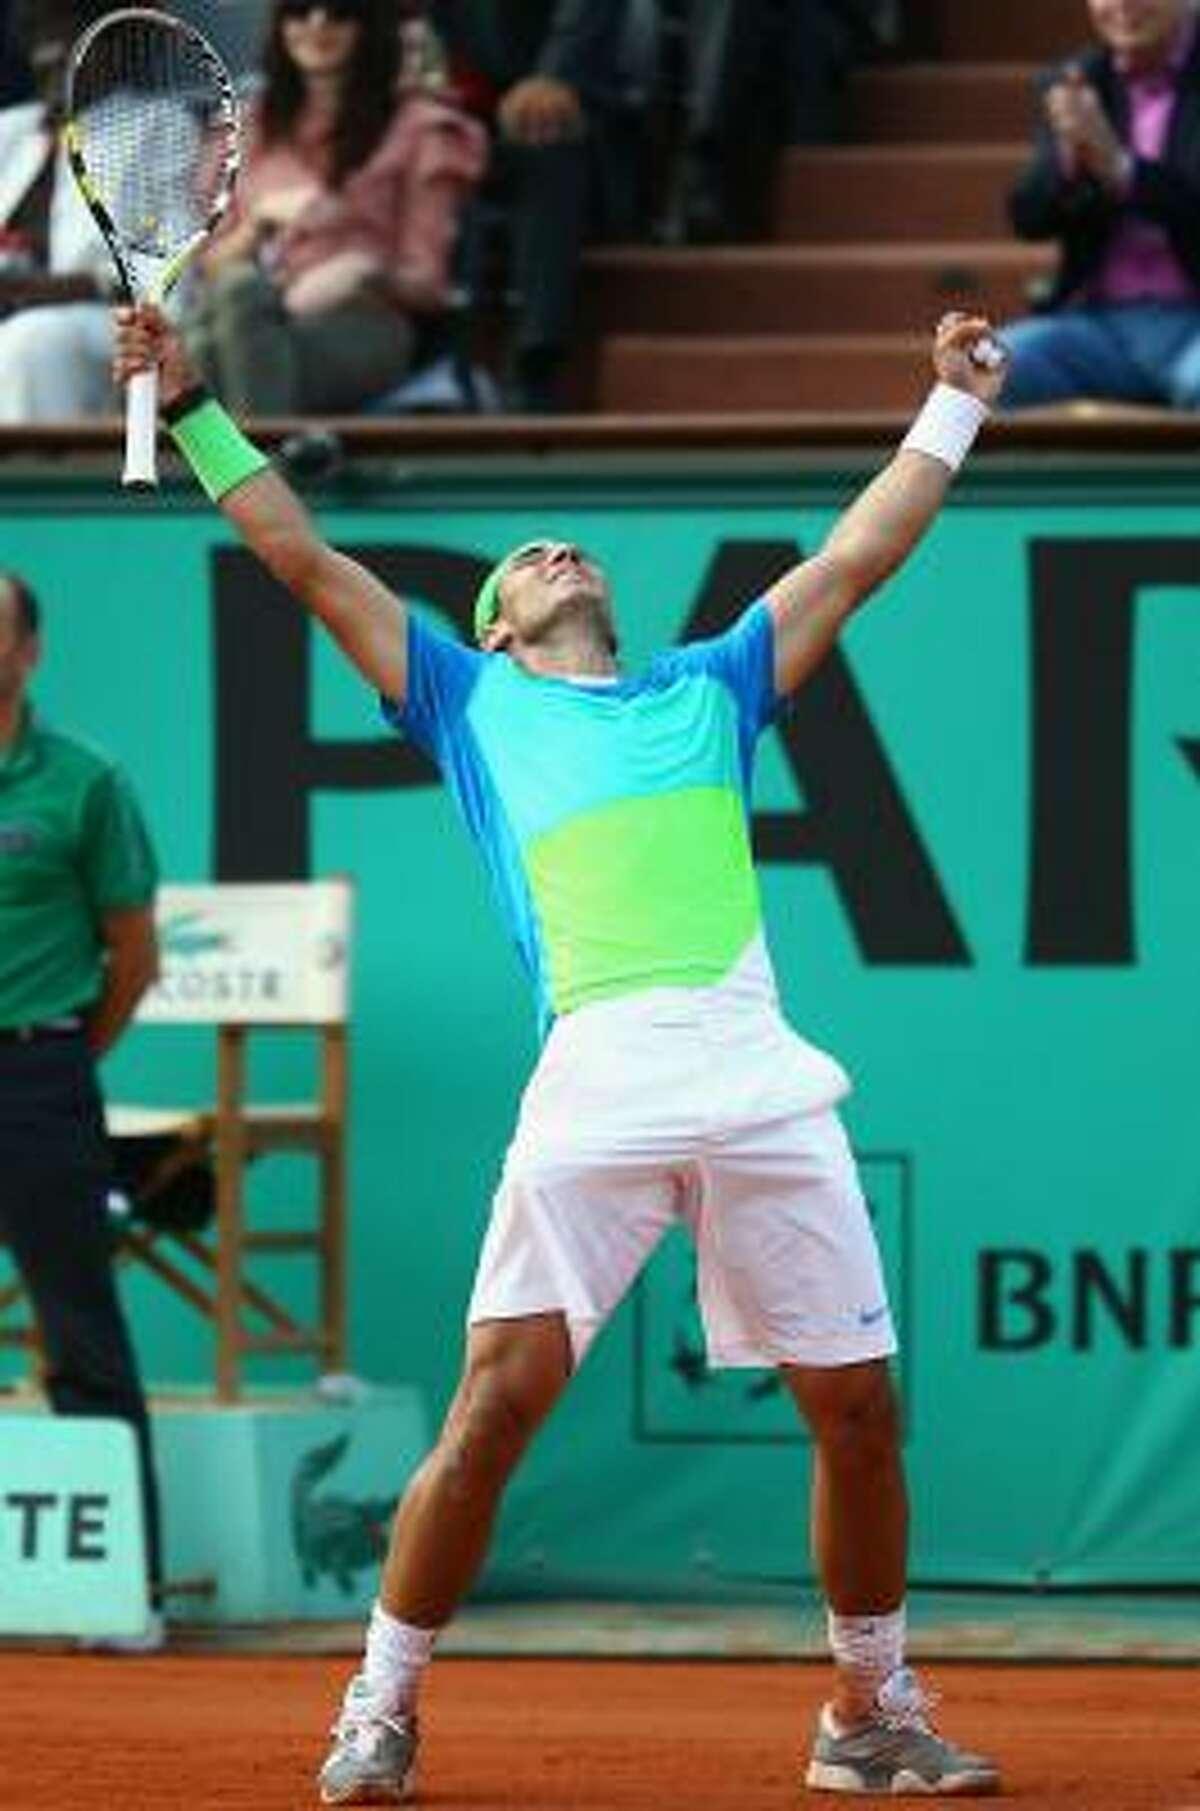 Rafael Nadal improved to 7-0 against Nicolas Almagro.